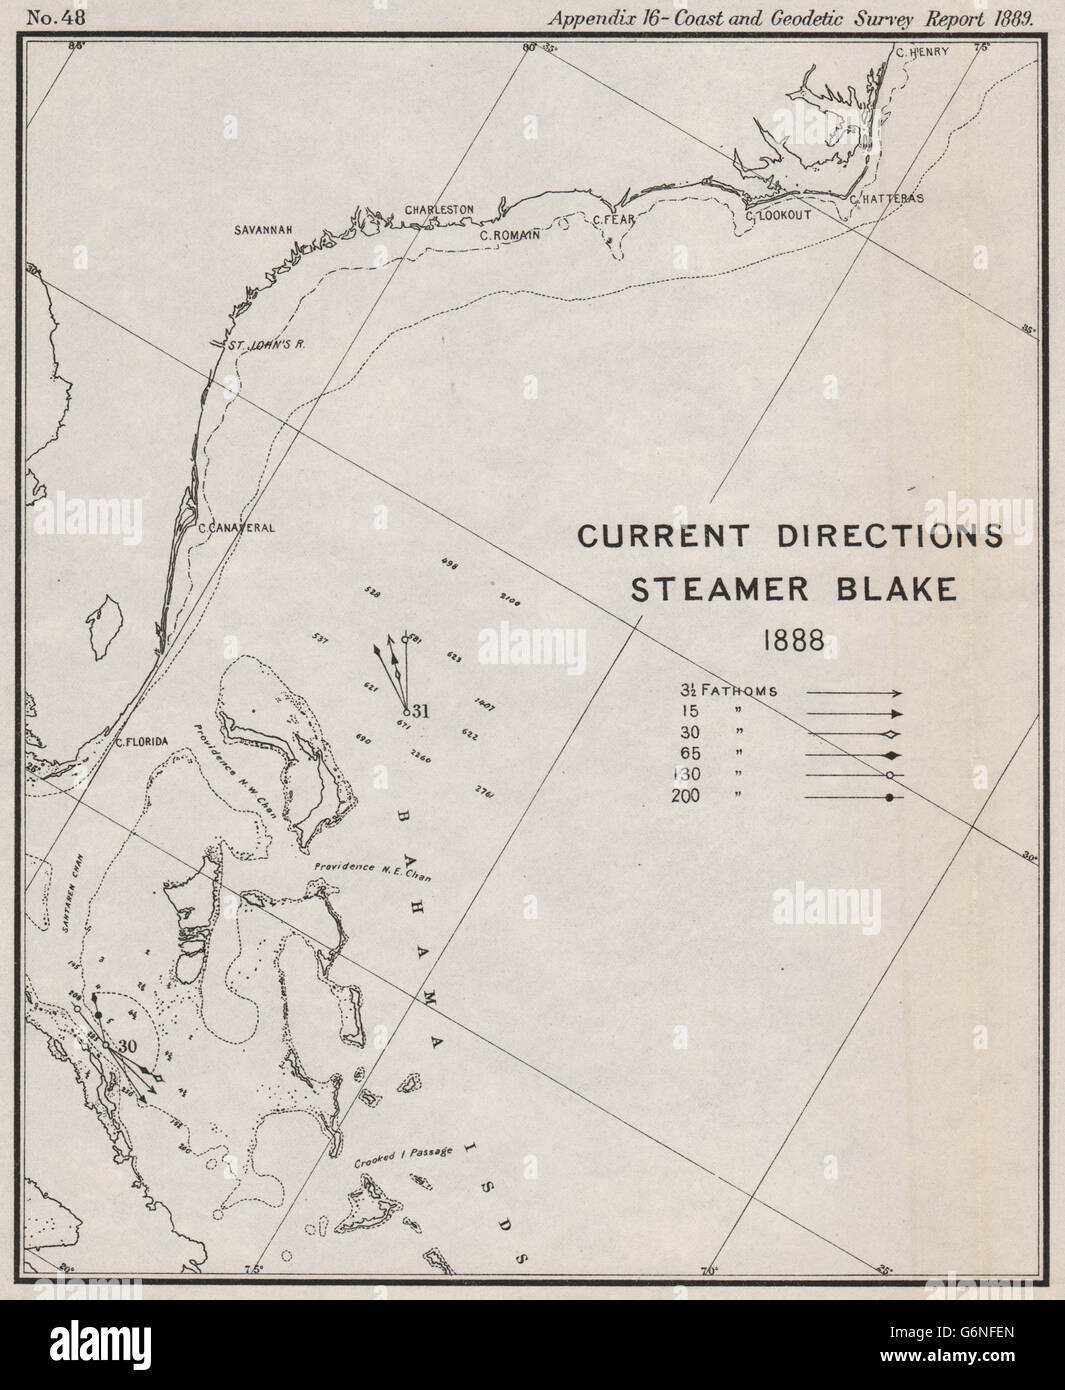 USA BAHAMAS Ocean Current Directions Gulf Stream USCGS - Map usa bahamas